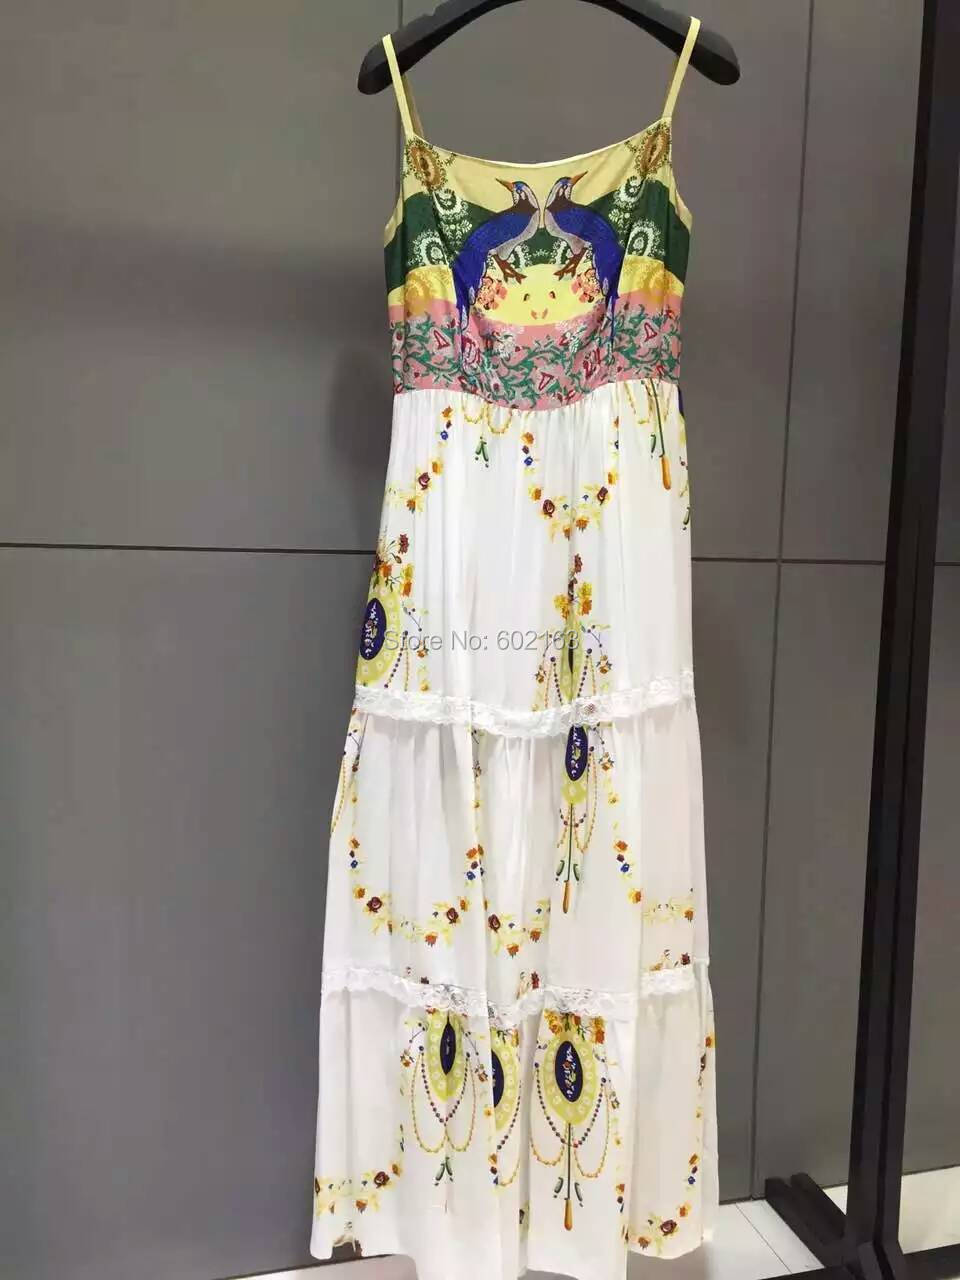 Luxury Brand 2016 Summer Dress Womens Sleeveless Maxi Dress Boho Style Dresses Women Одежда и ак�е��уары<br><br><br>Aliexpress